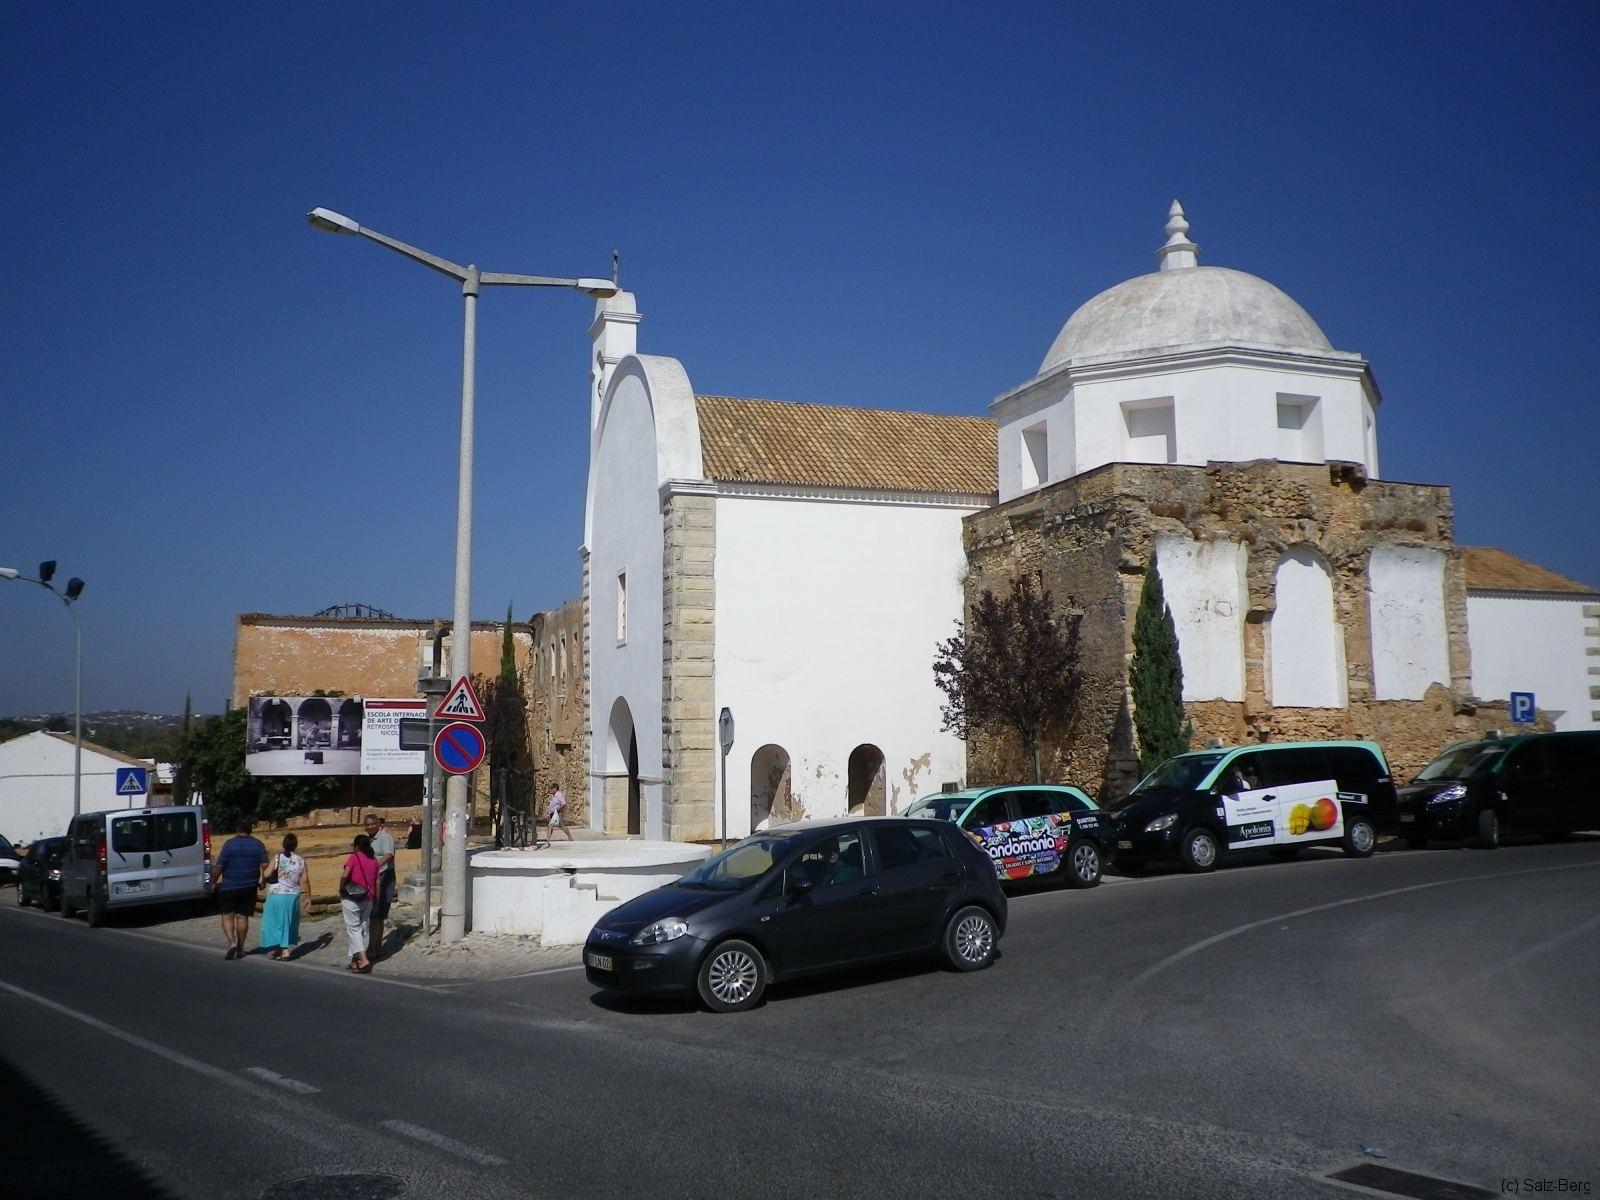 Algarve-506-IMGP5187